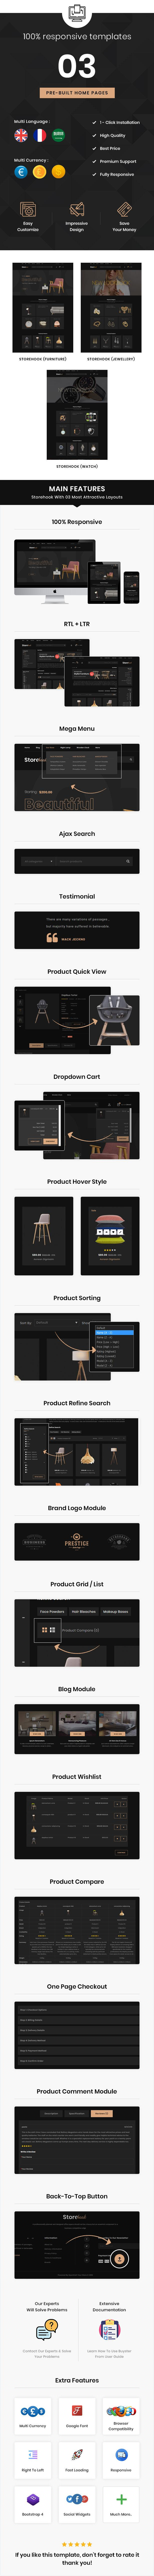 Storehook Minimal - Responsive Opencart 3.0 Theme - 4